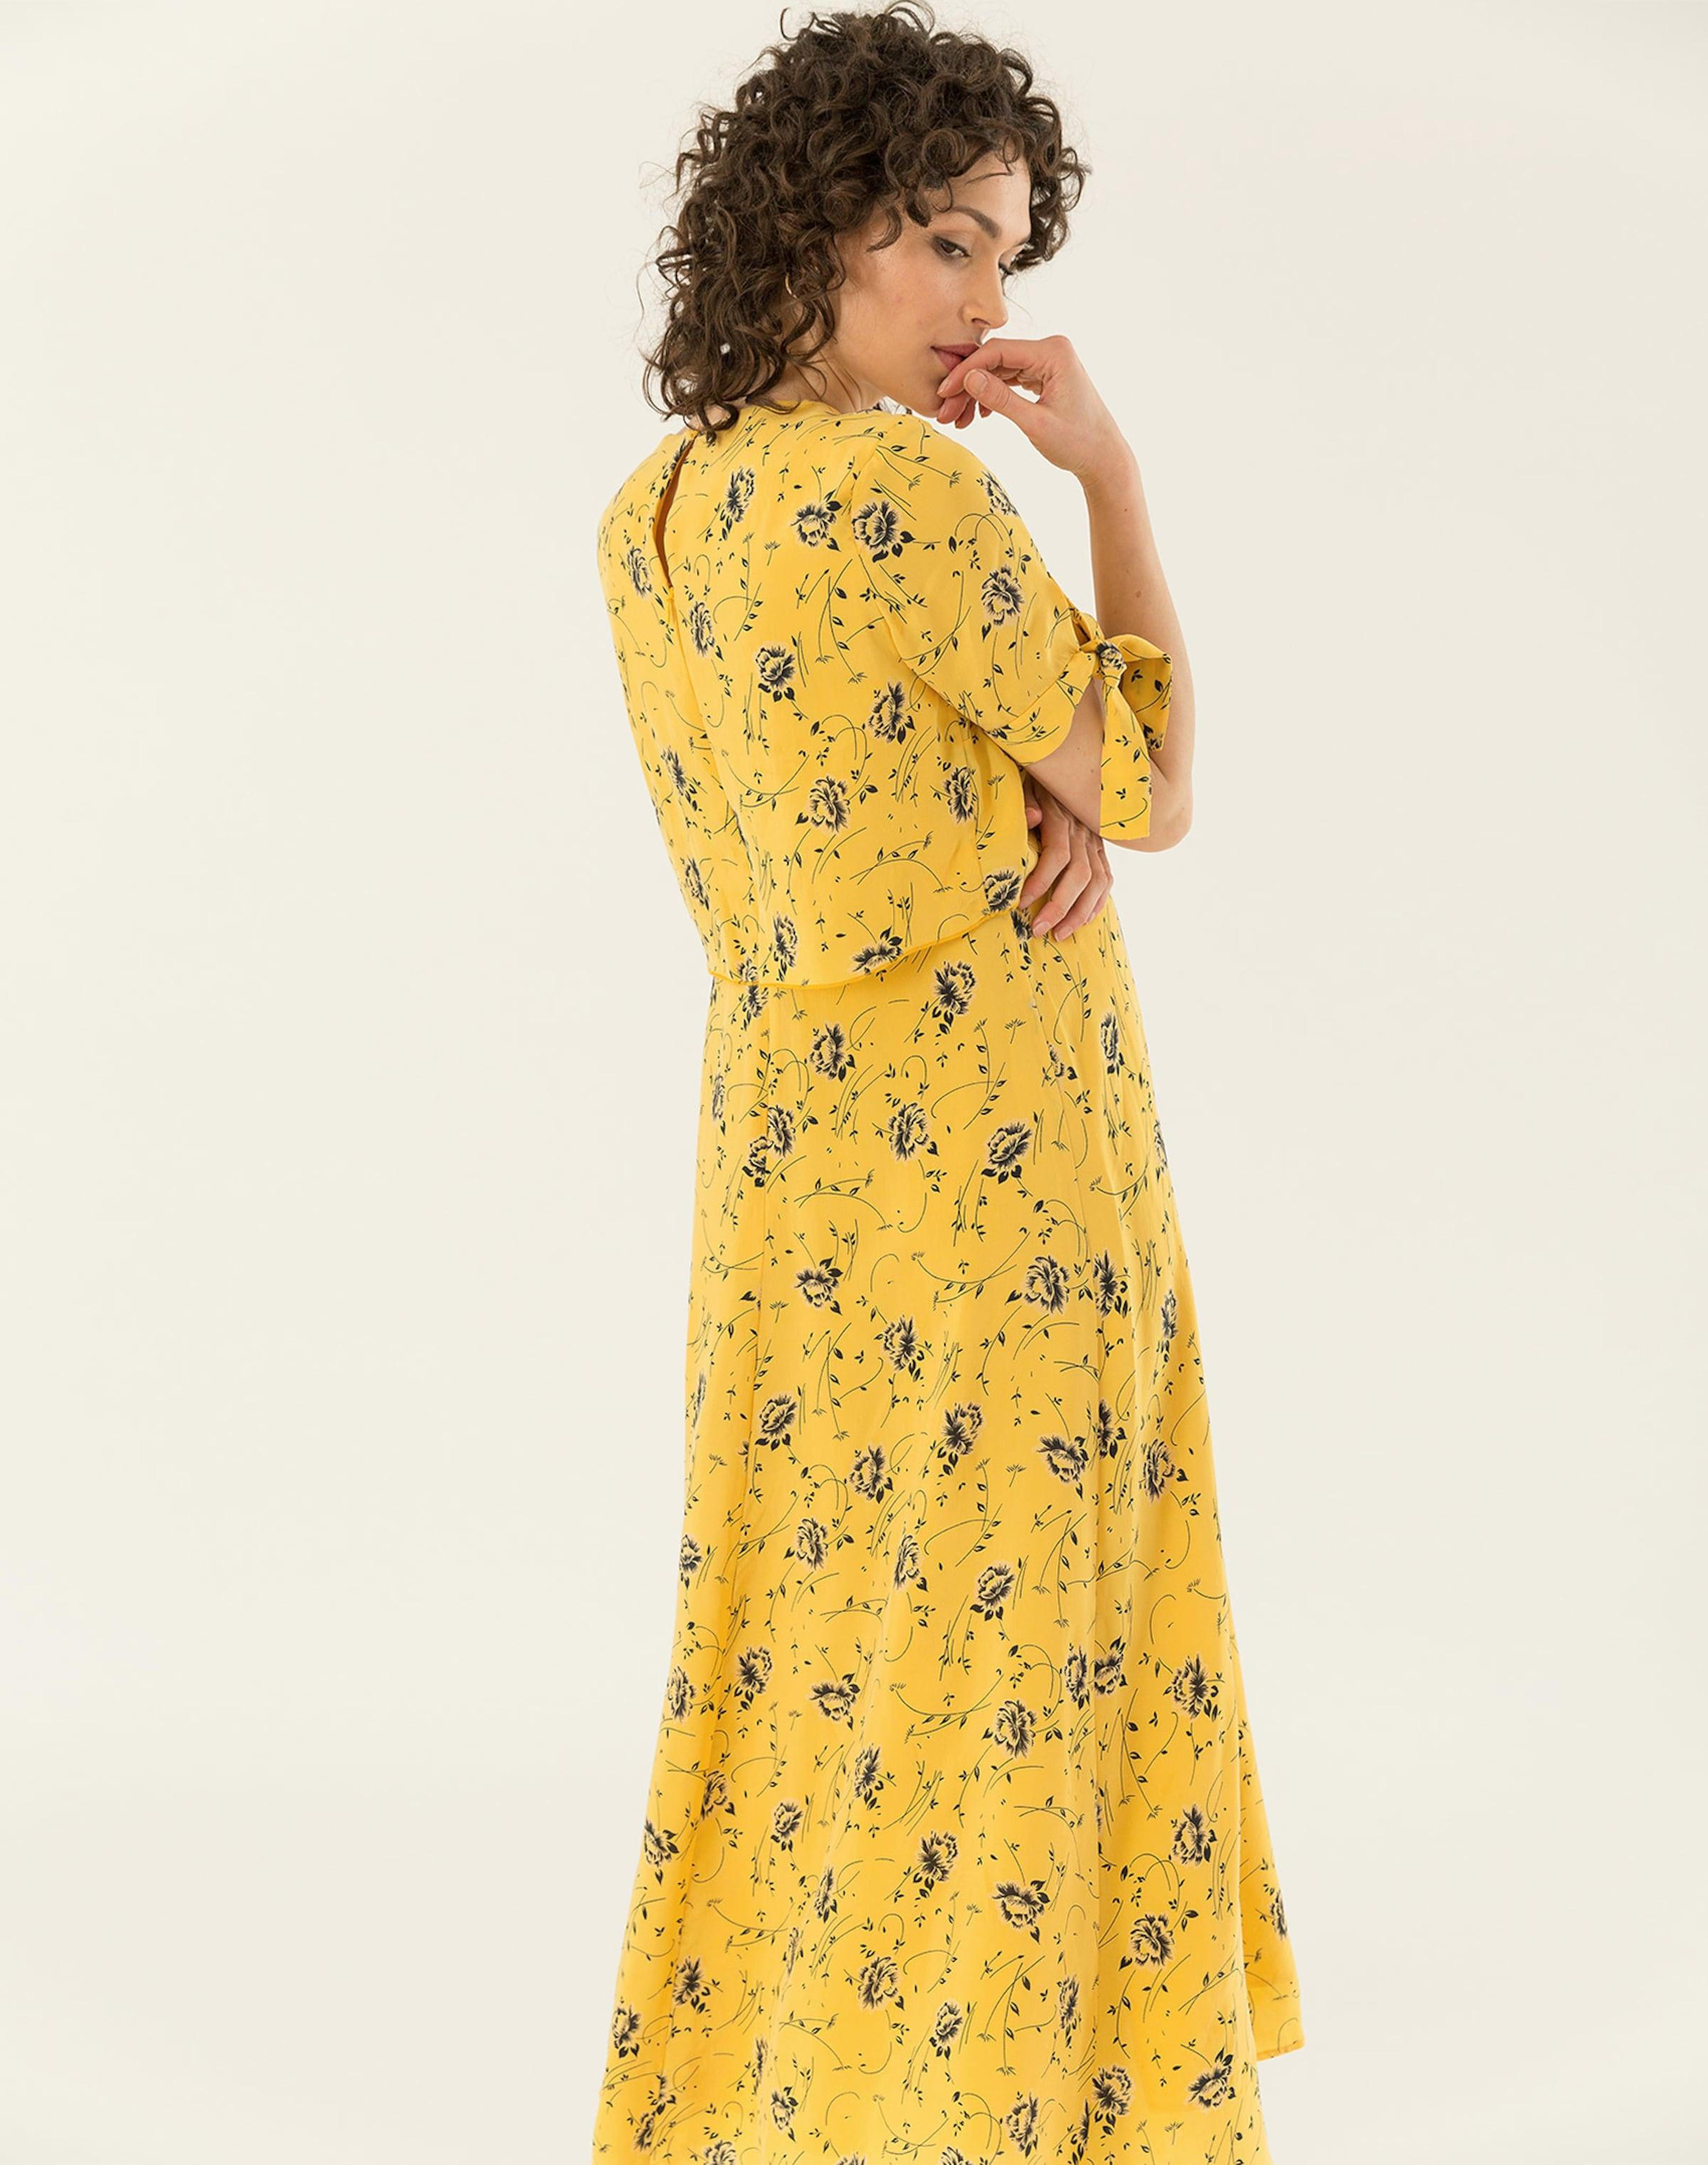 Dress In Oak GelbSchwarz Ivyamp; Ivyamp; rCxdWBoe